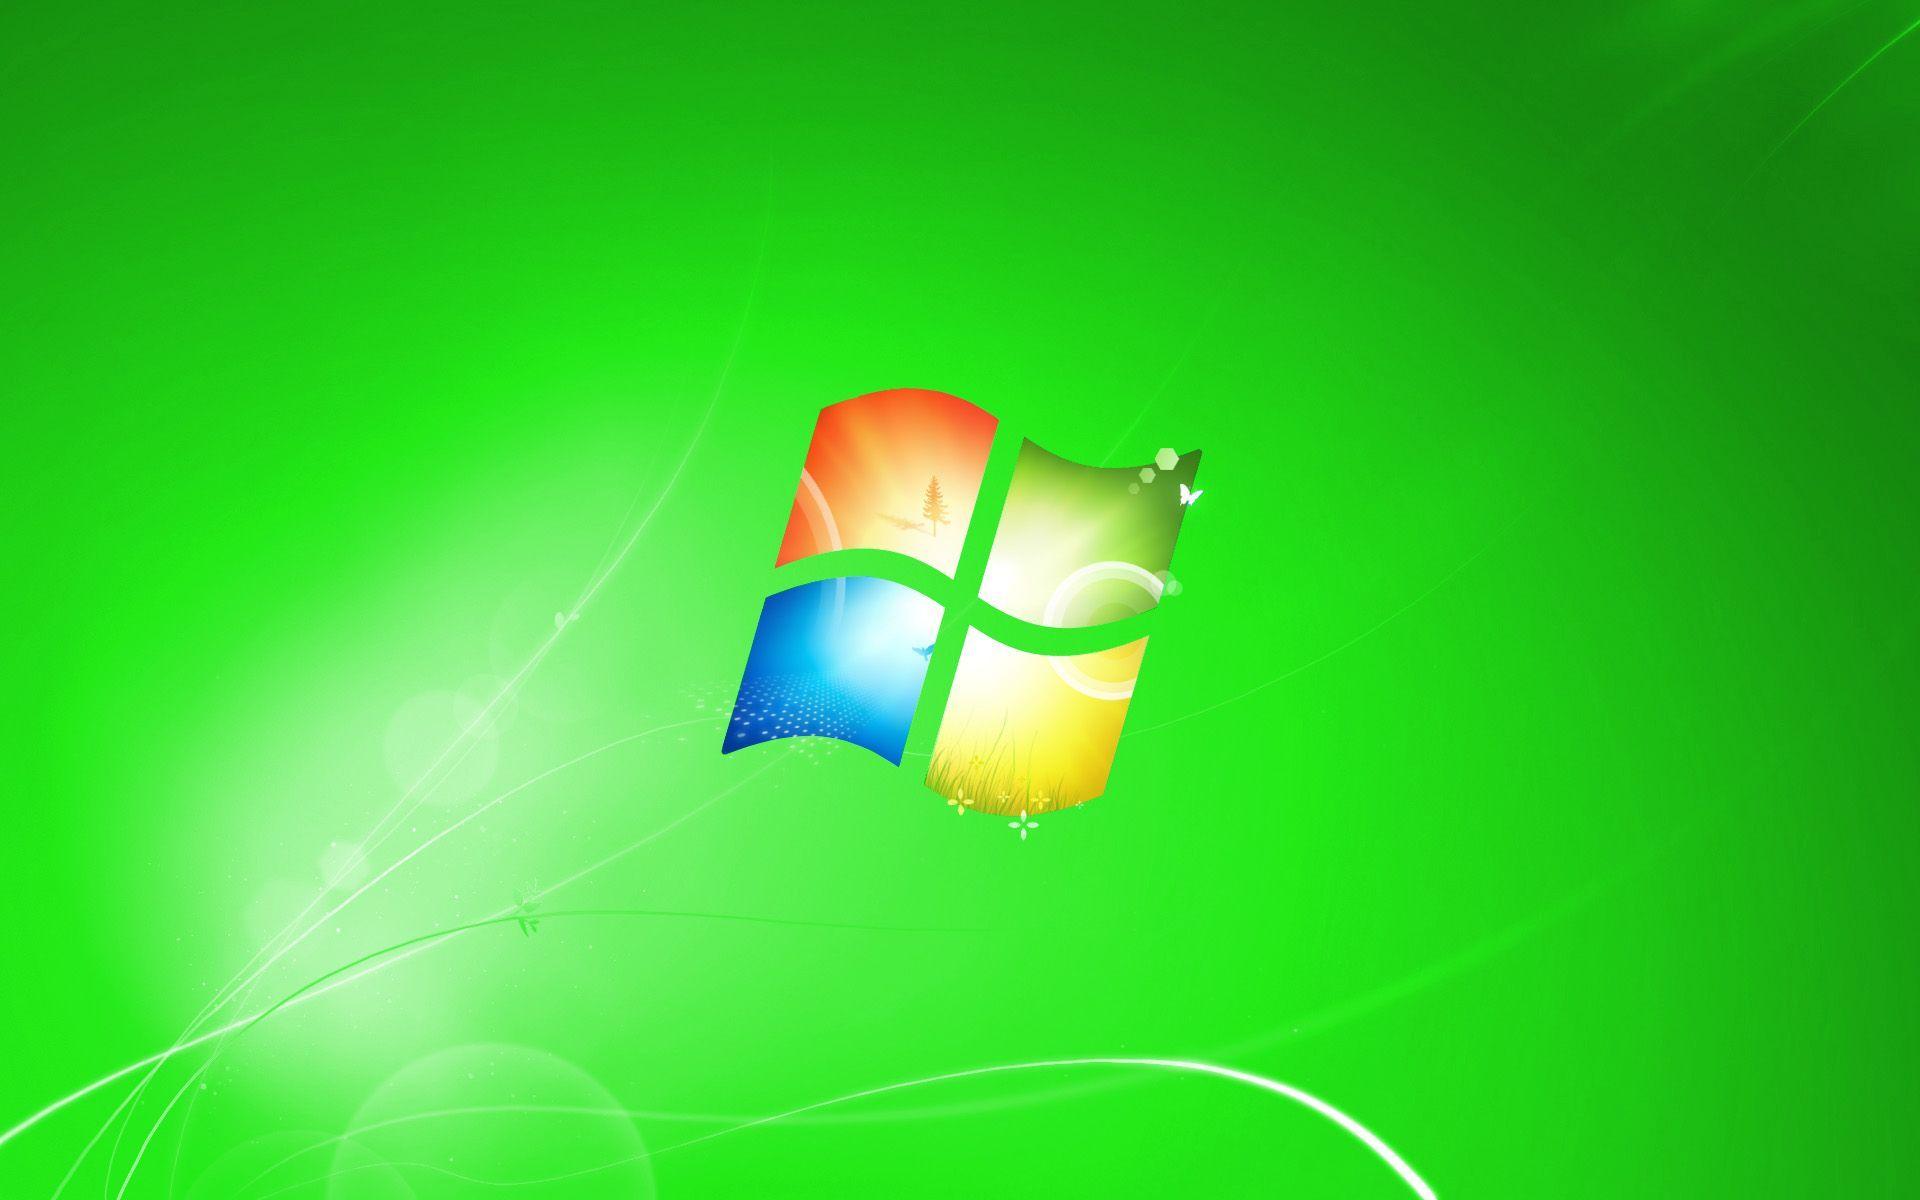 Original Windows Xp Wallpaper 1920 1200 Windows Xp Original Wallpapers 47 Wallpapers A Green Wallpaper Backgrounds Desktop Desktop Wallpapers Backgrounds